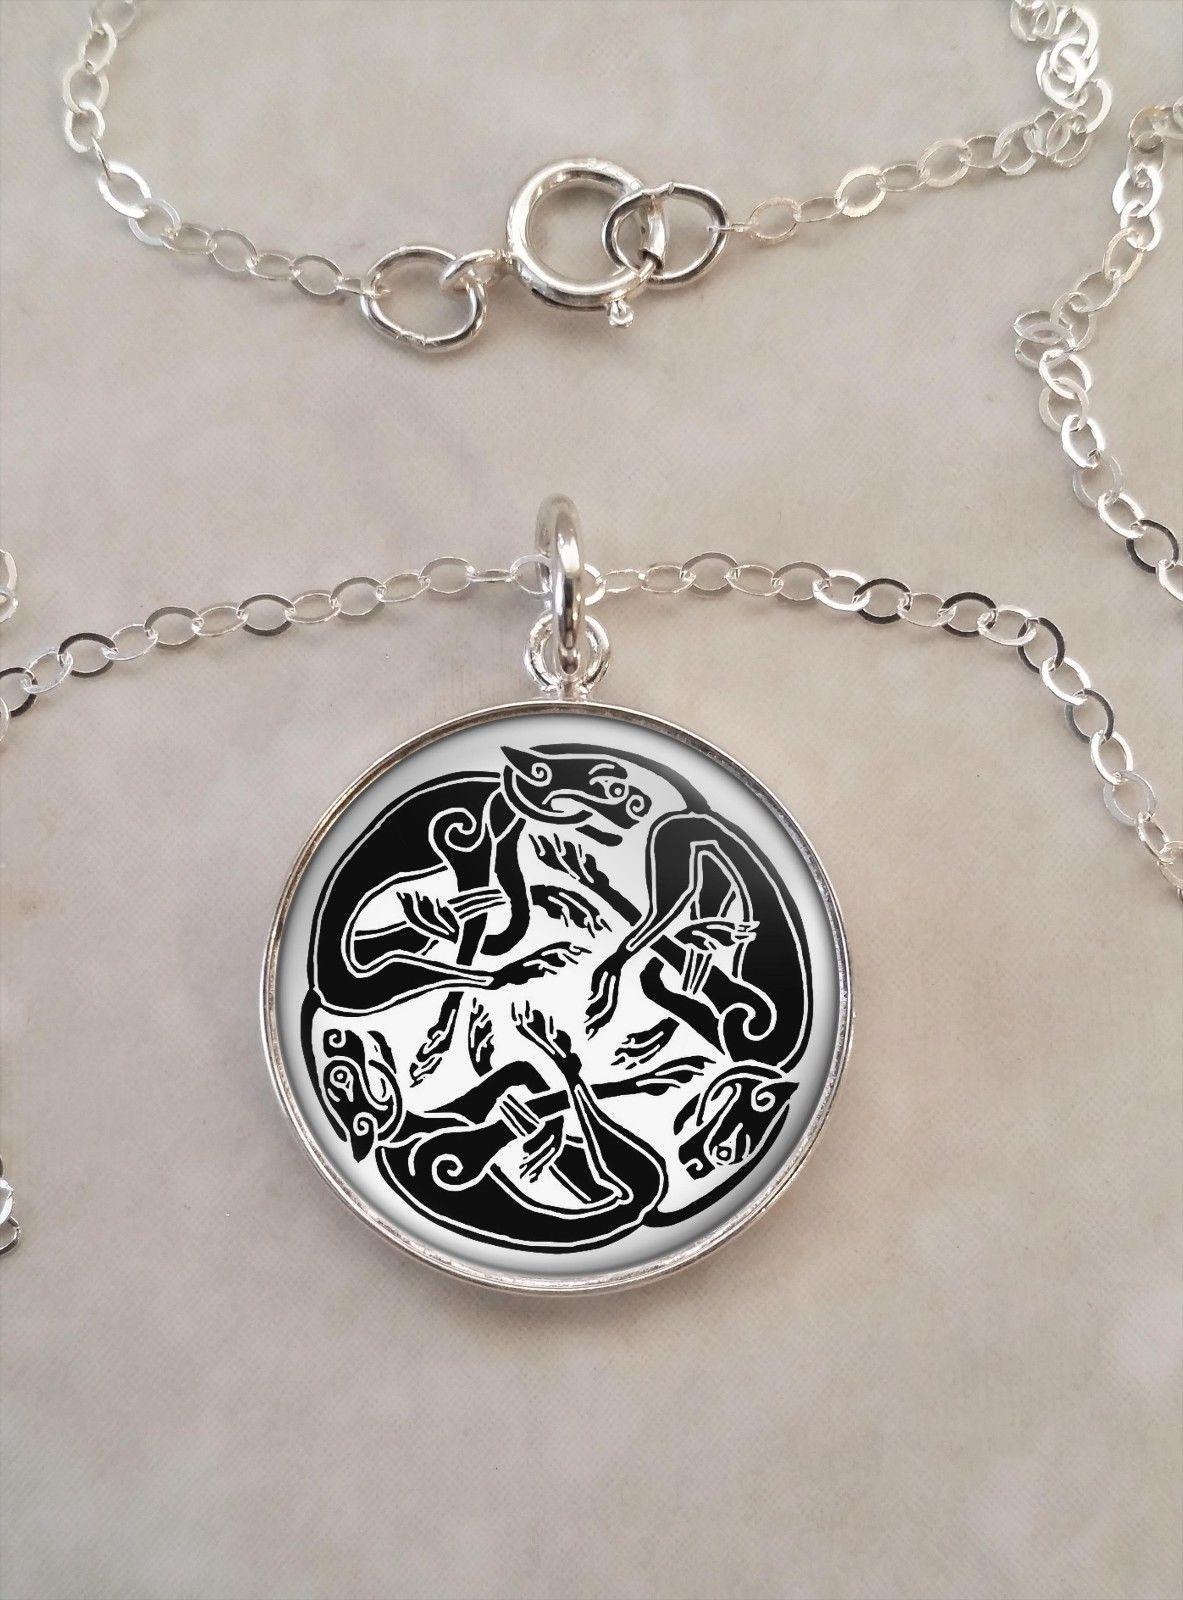 Sterling Silver 925 Pendant Necklace Celtic Cat Art Feline Animal - $30.50 - $50.50